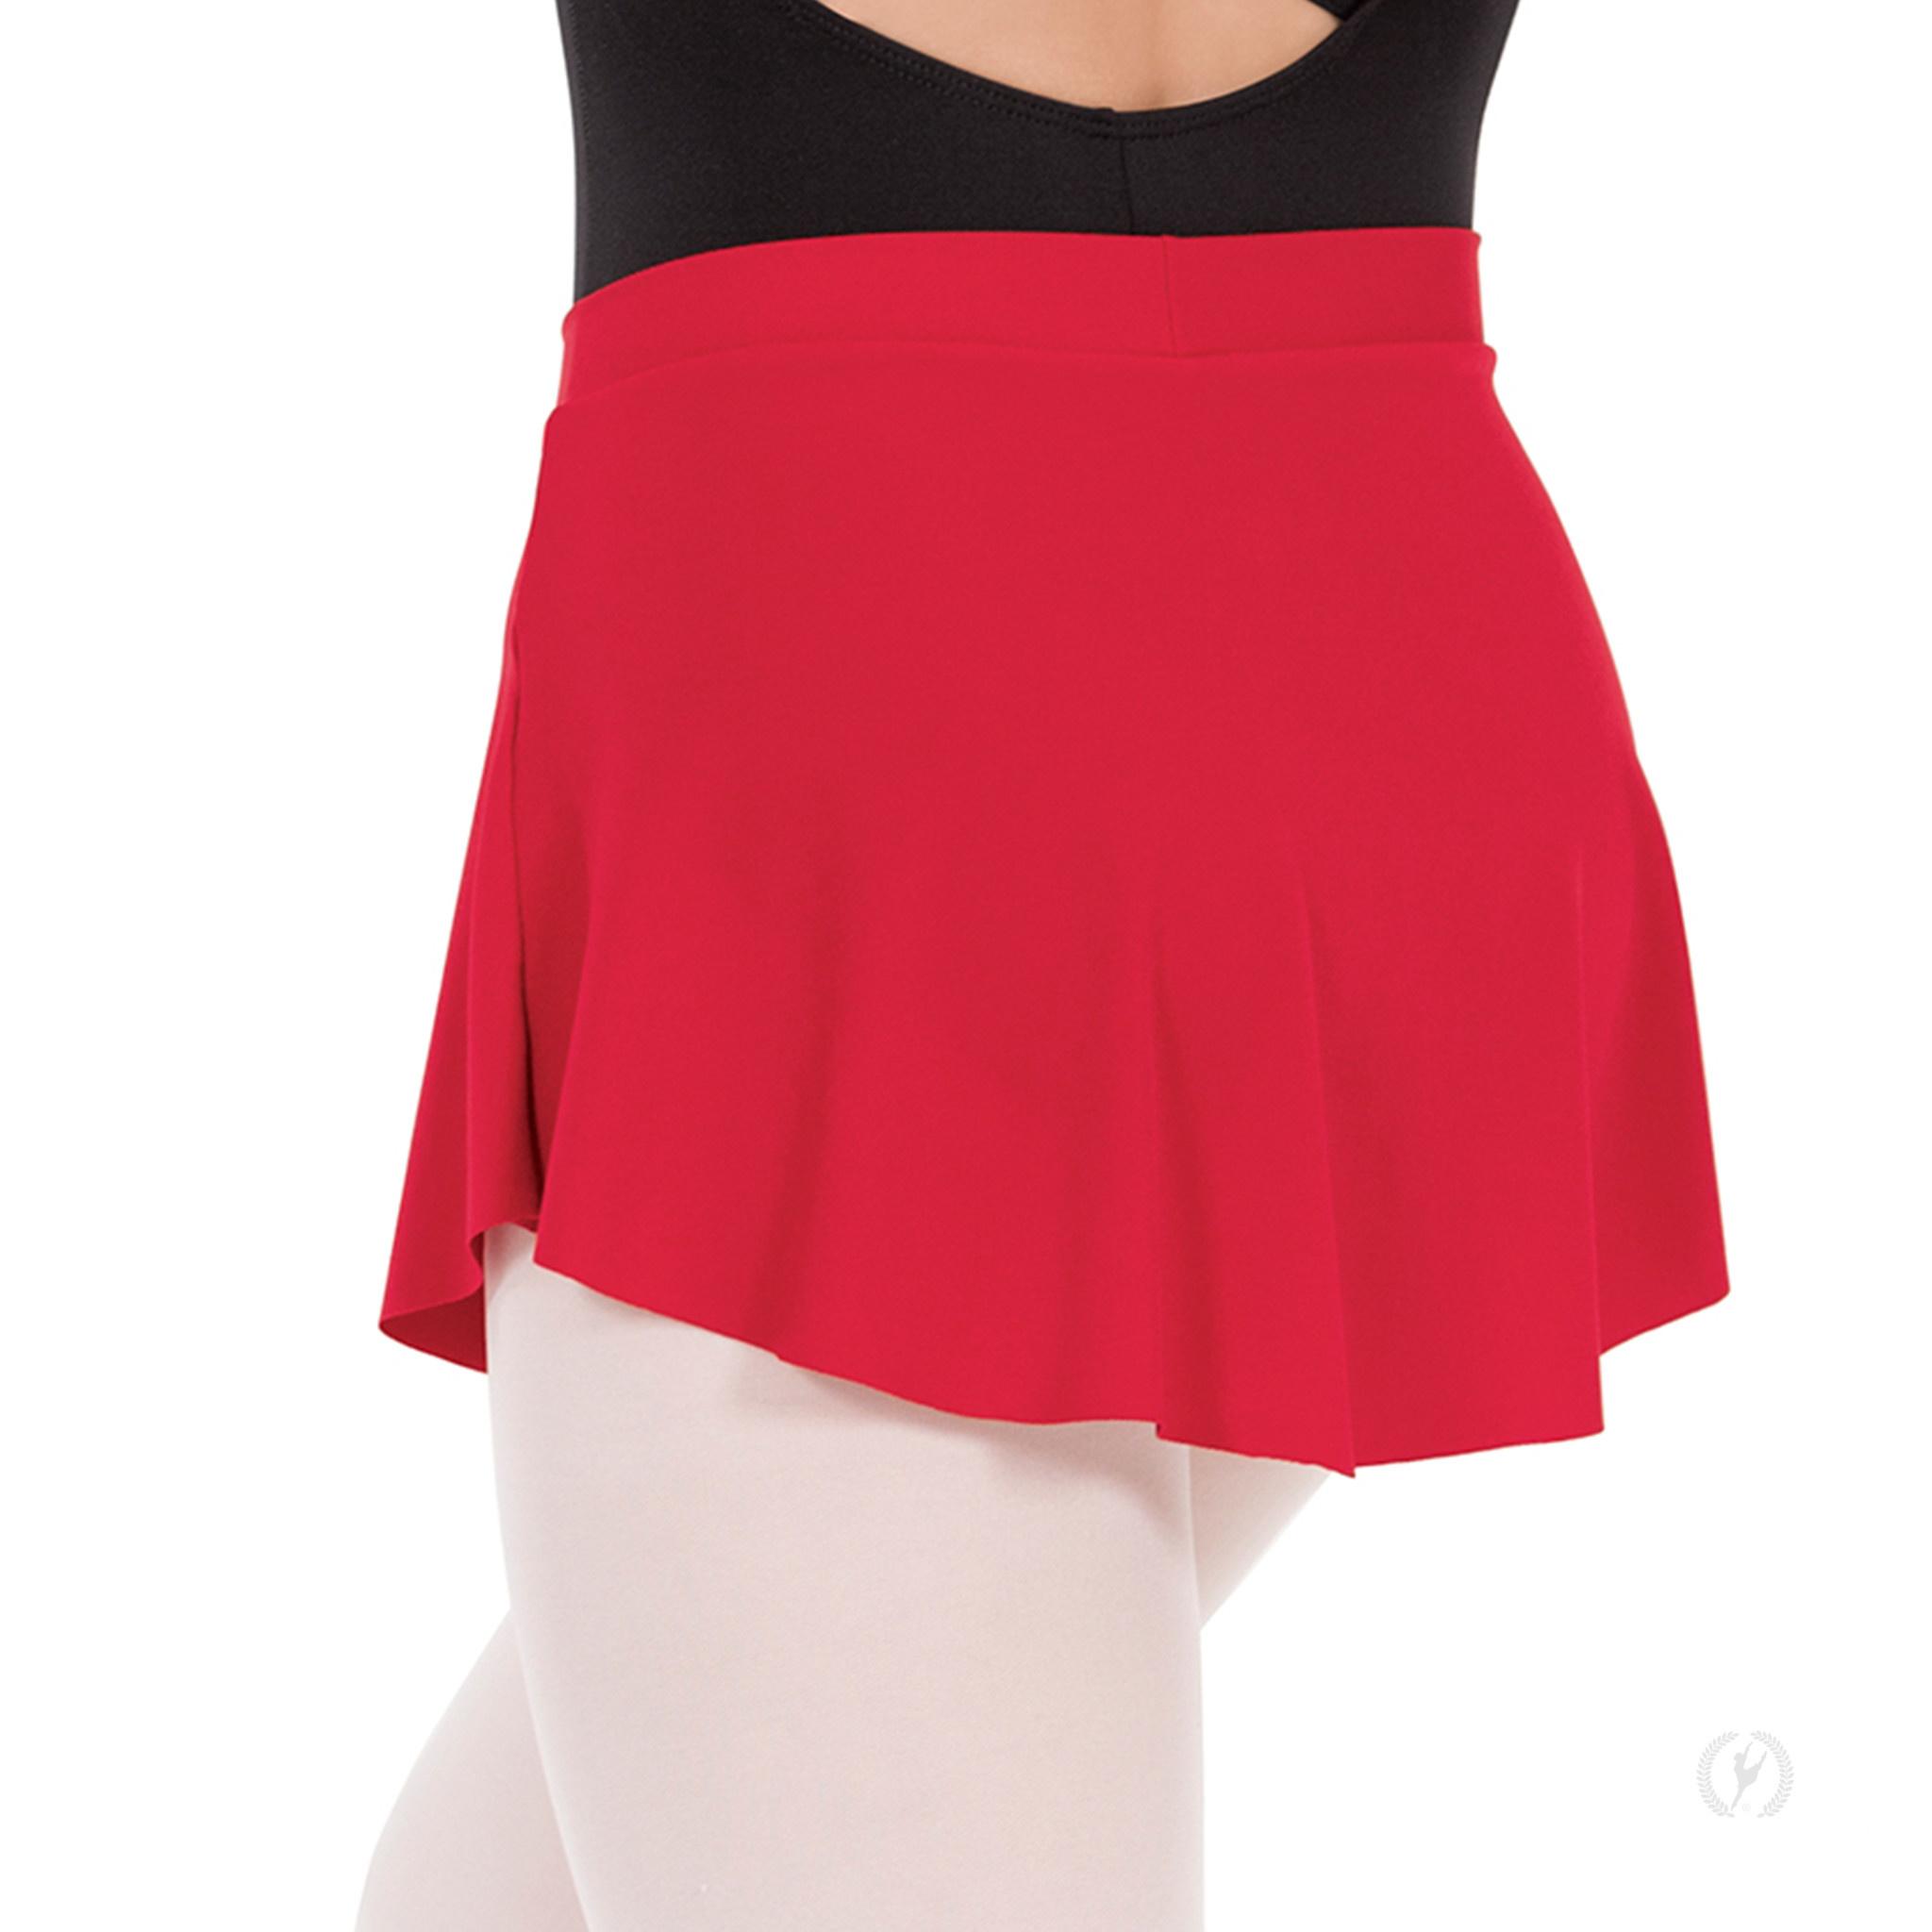 Eurotard 06121 - Womens High Low Pull-On Ballet Skirt